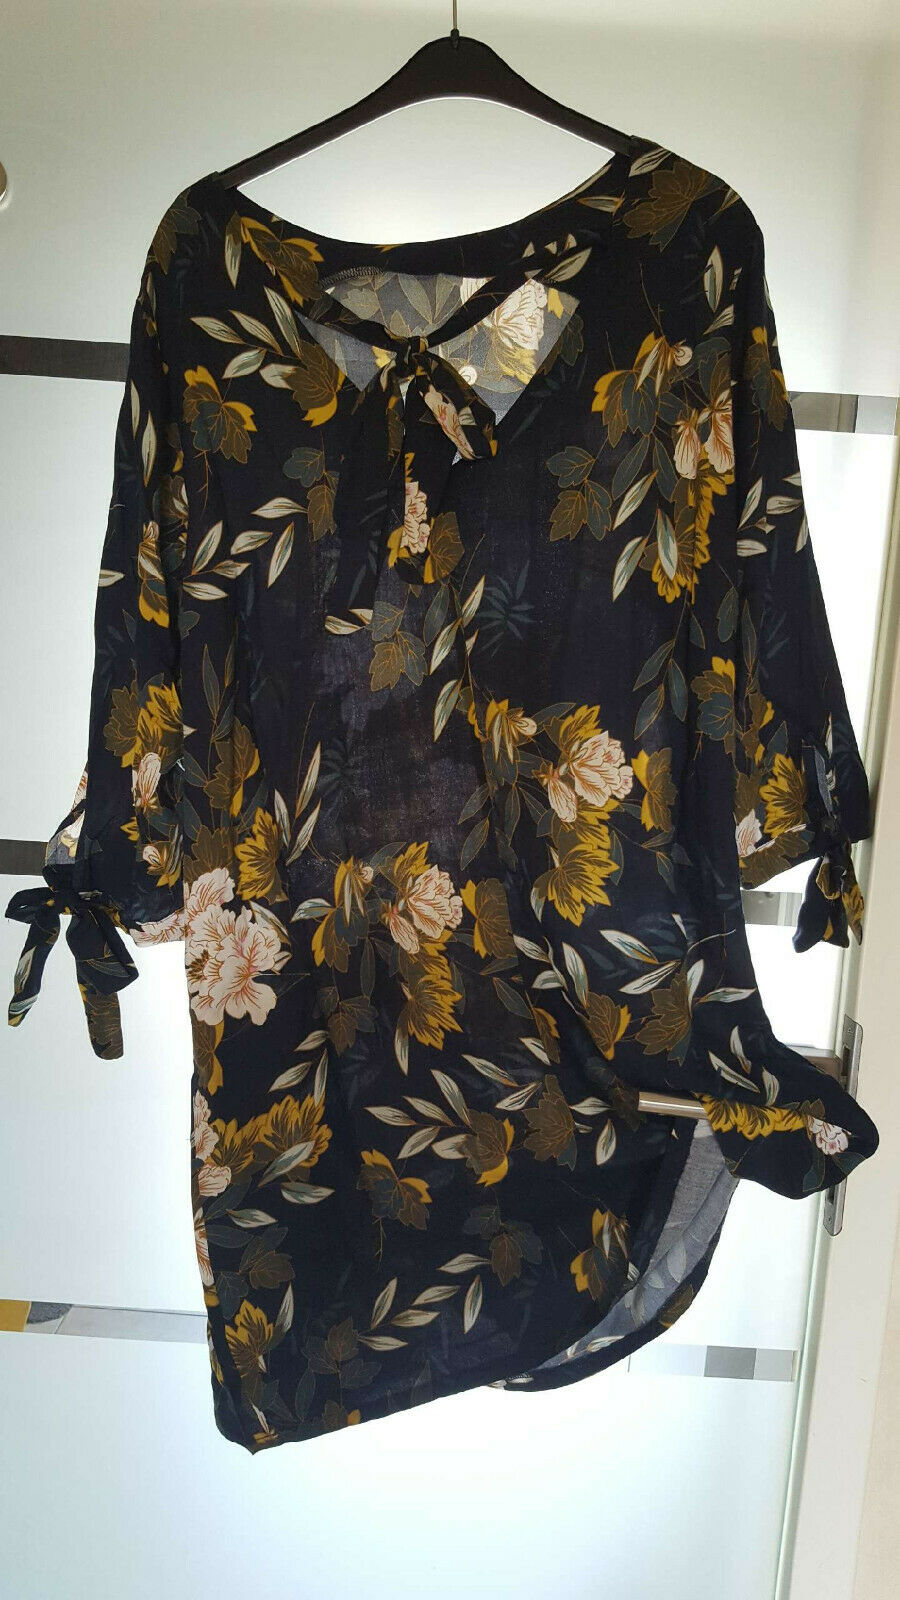 Boho Damen Kleid Sommer Blumen blau Longshirt Tunika Bluse Hemdkleid 36 - 54 neu